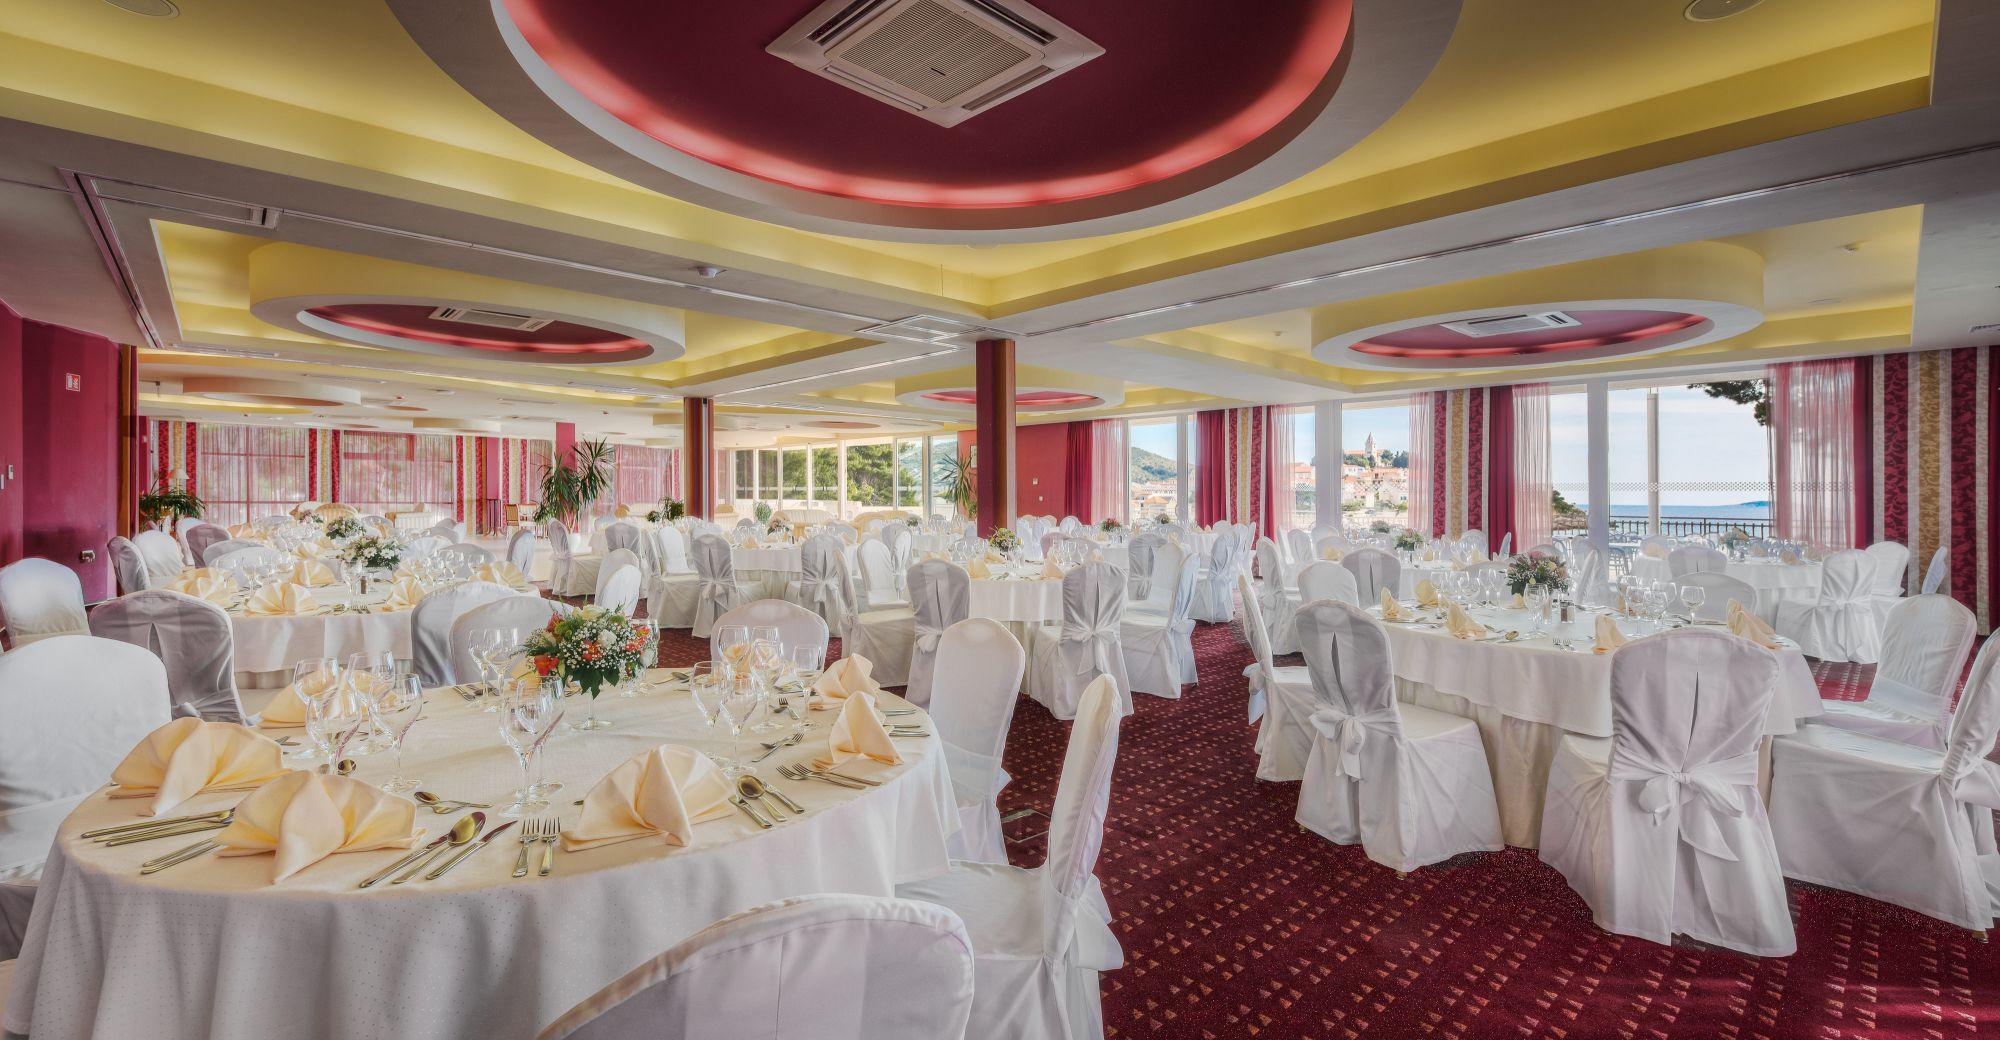 congress center gala dinner 04 14639492418 o - Zora Hotel